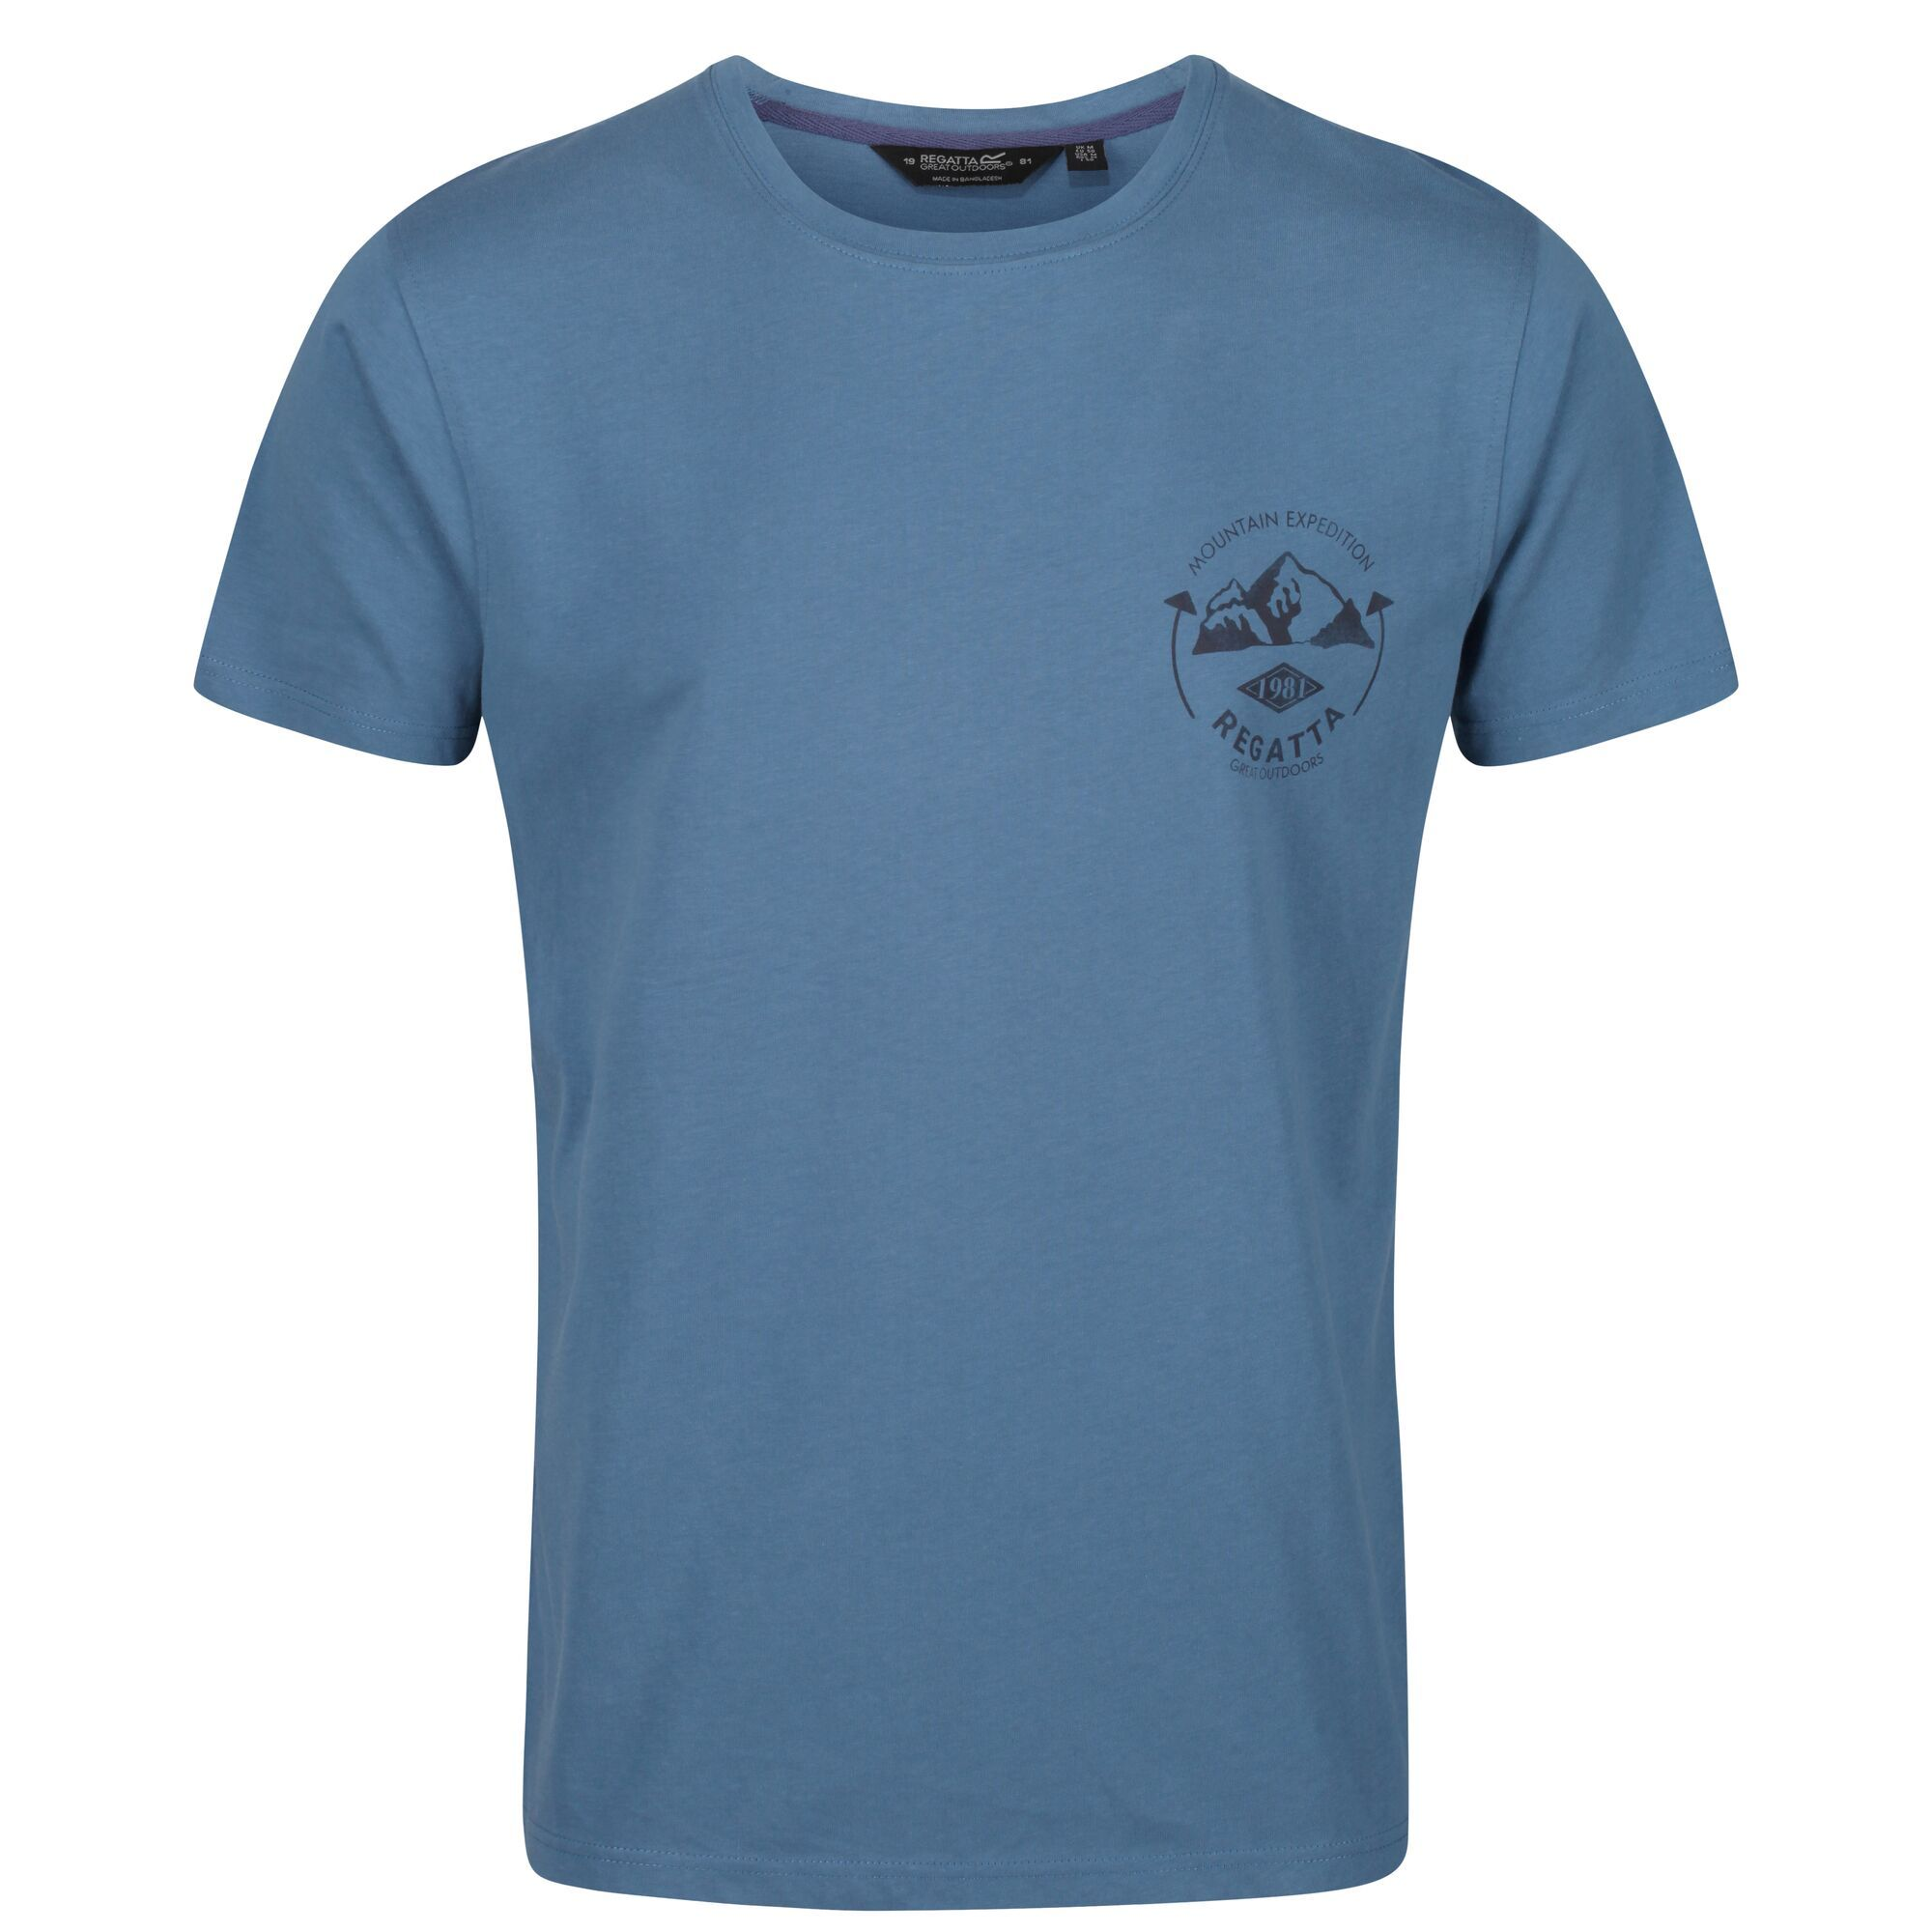 Regatta Mens Cline IV Graphic T-Shirt (Stellar Blue)